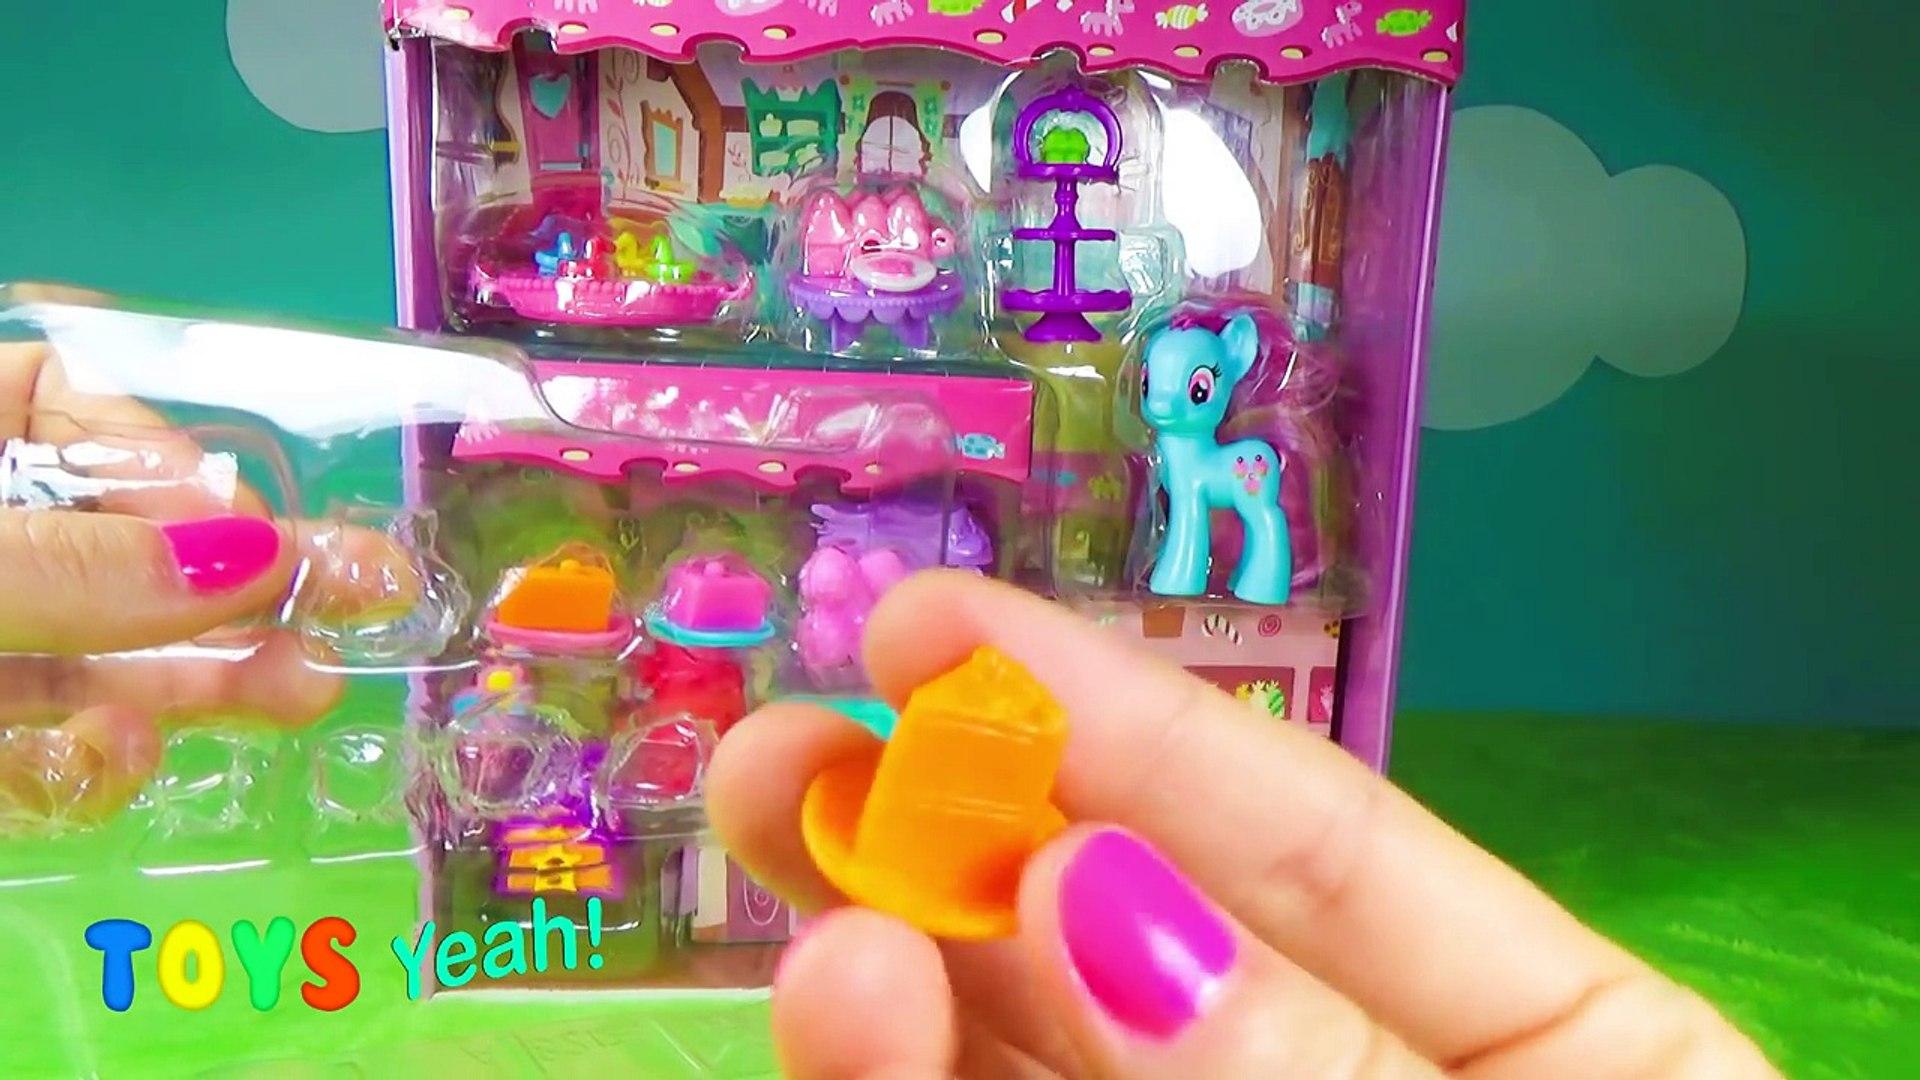 My Little Pony MLP - Sweet Rainbow Bakery - Rainbow Power - Play Doh - Unboxing Toy